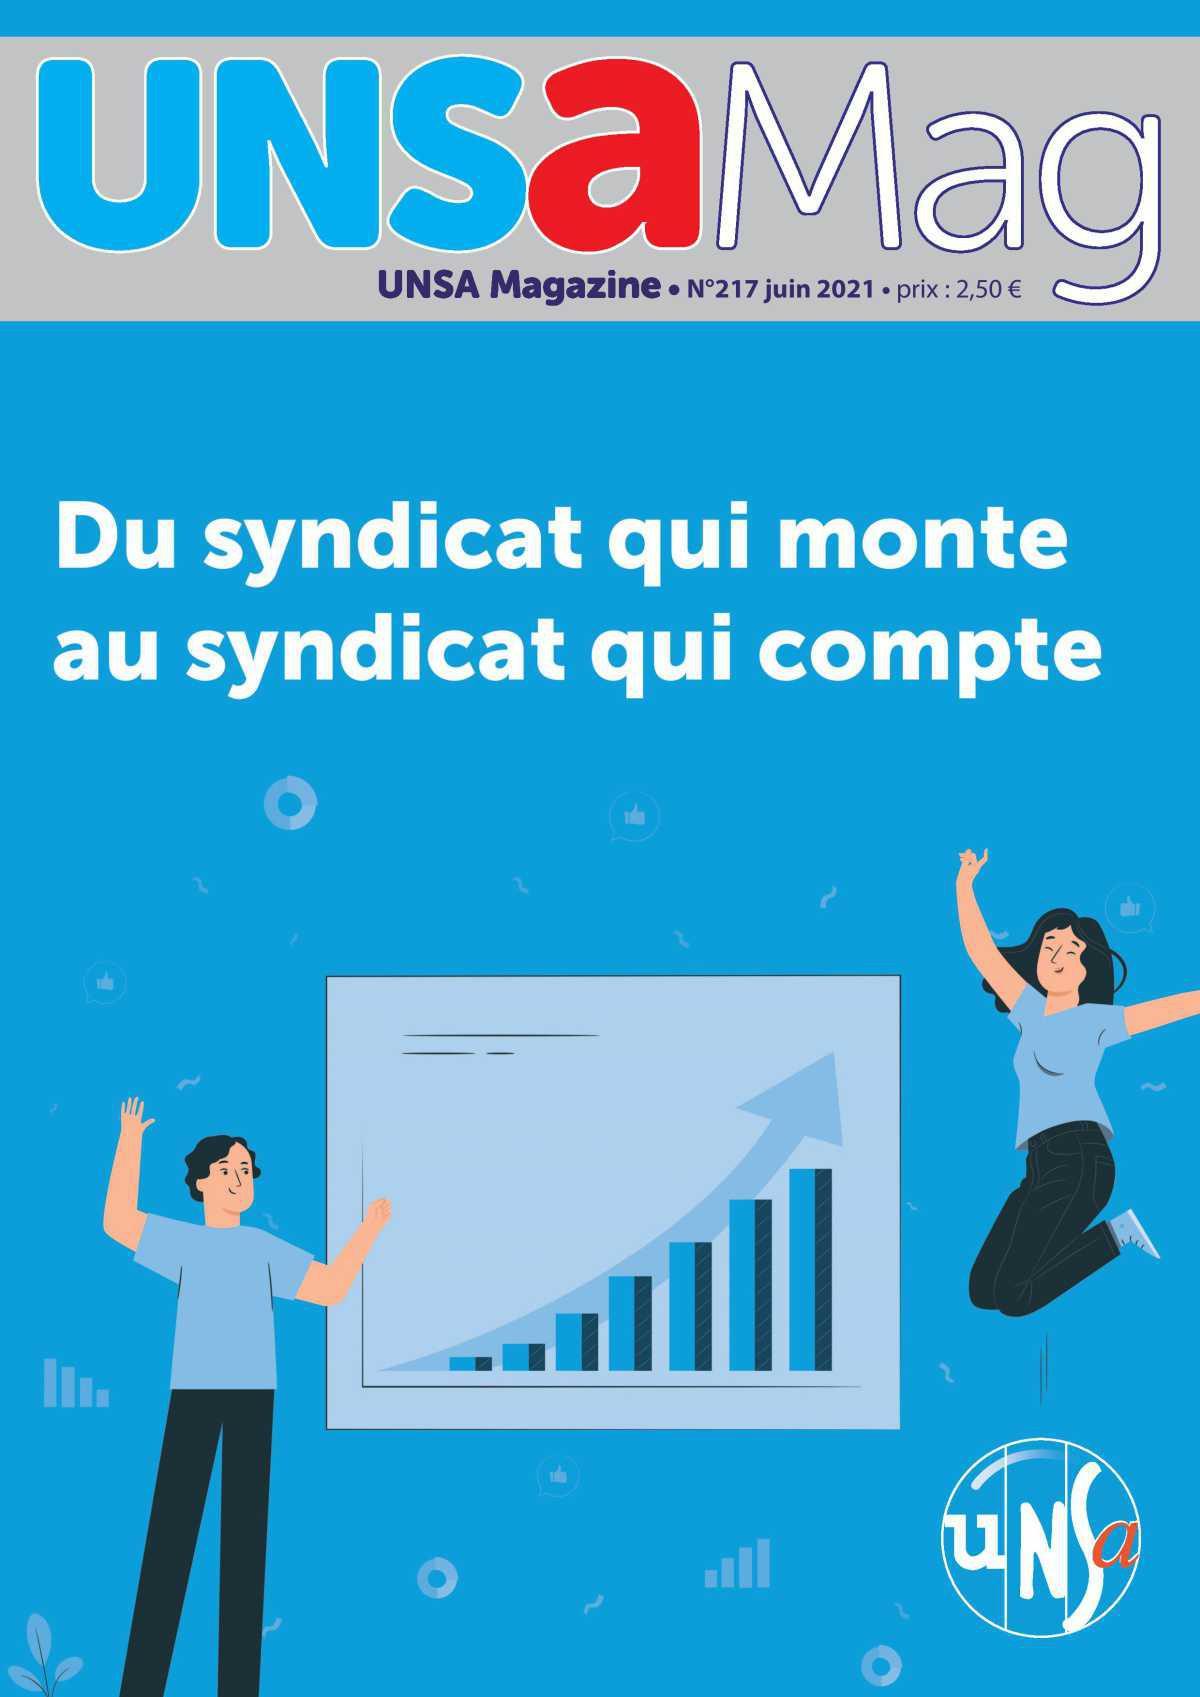 N°217 - du syndicat qui monte au syndicat qui compte !